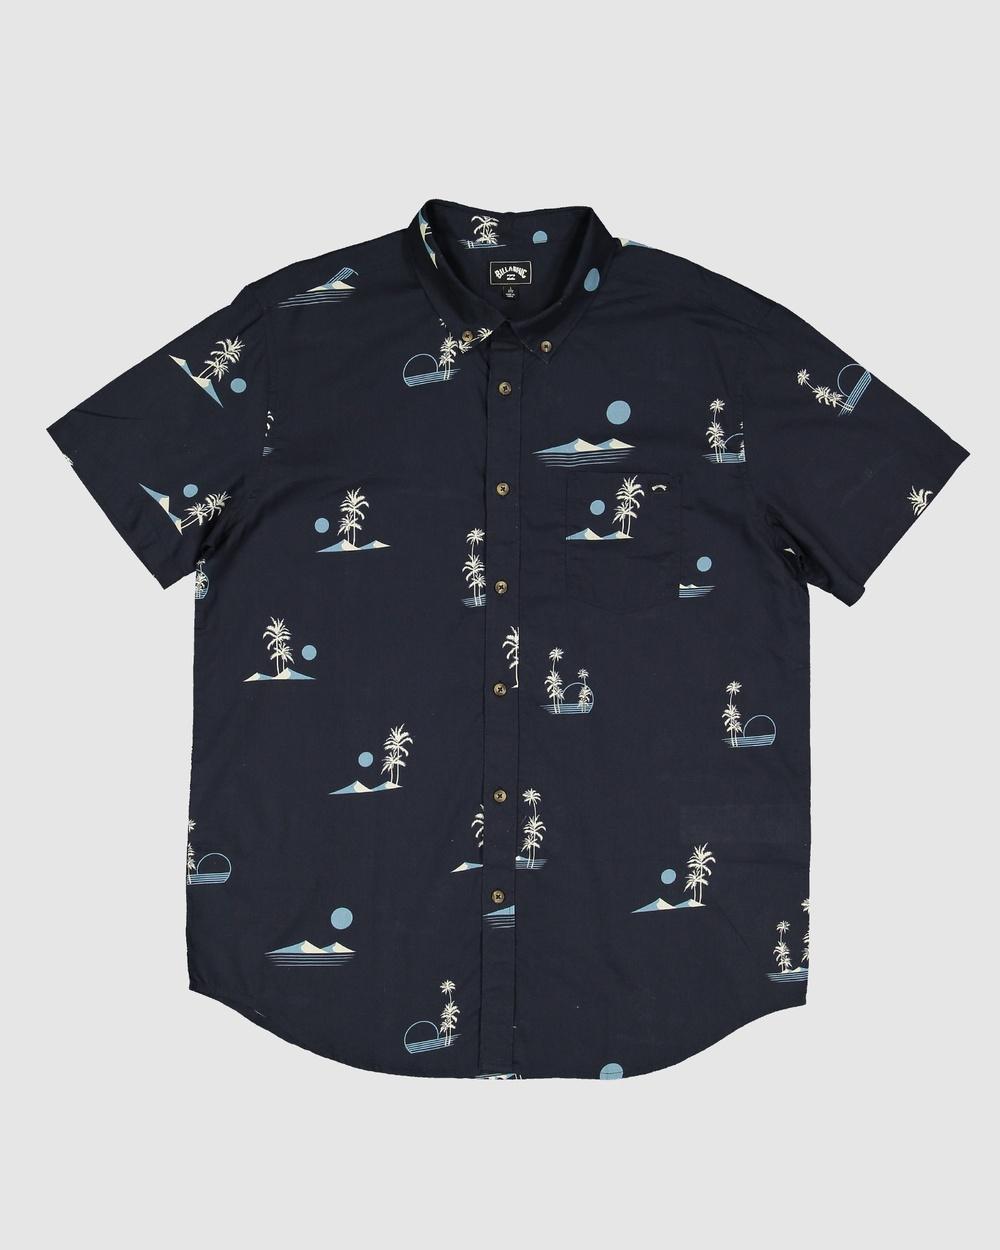 Billabong - Boys Sundays Mini Ss - Long Sleeve T-Shirts (DARK NAVY) Boys Sundays Mini Ss